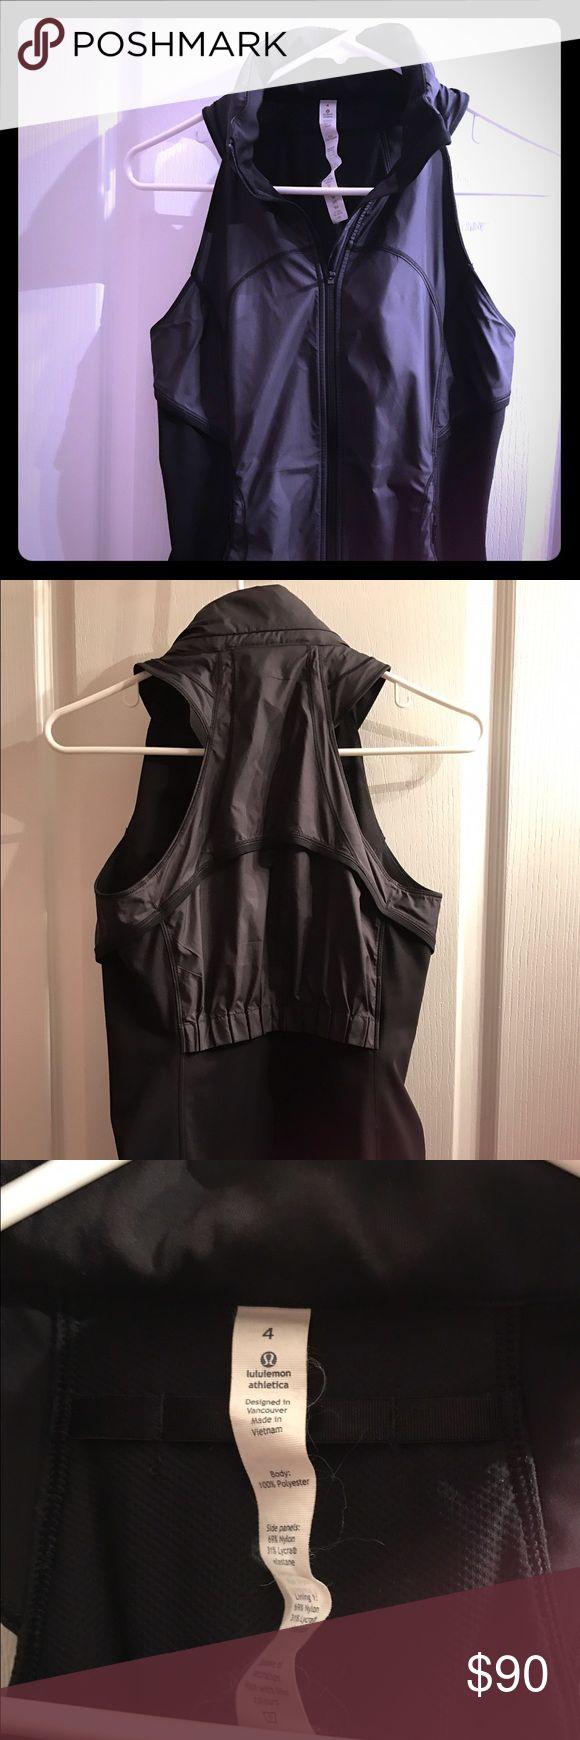 Lululemon Vest Size 4 Lululemon Black Vest Size 4. Fitted Vest with zipped hood. Worn 2x. lululemon athletica Tops